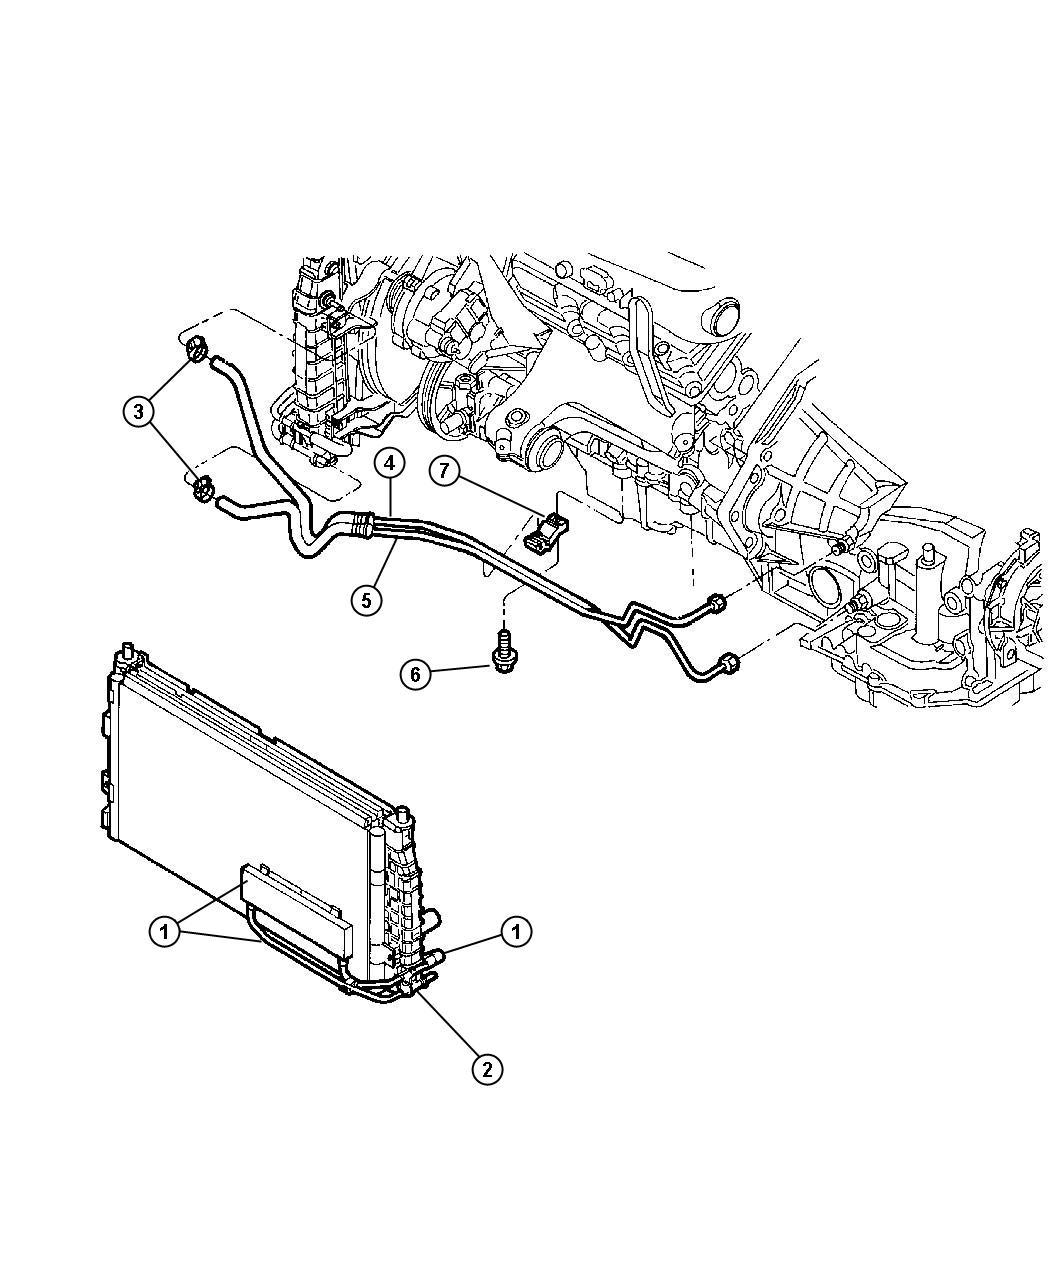 2000 Chrysler Lhs Fuel Pressure Regulator Location, 2000